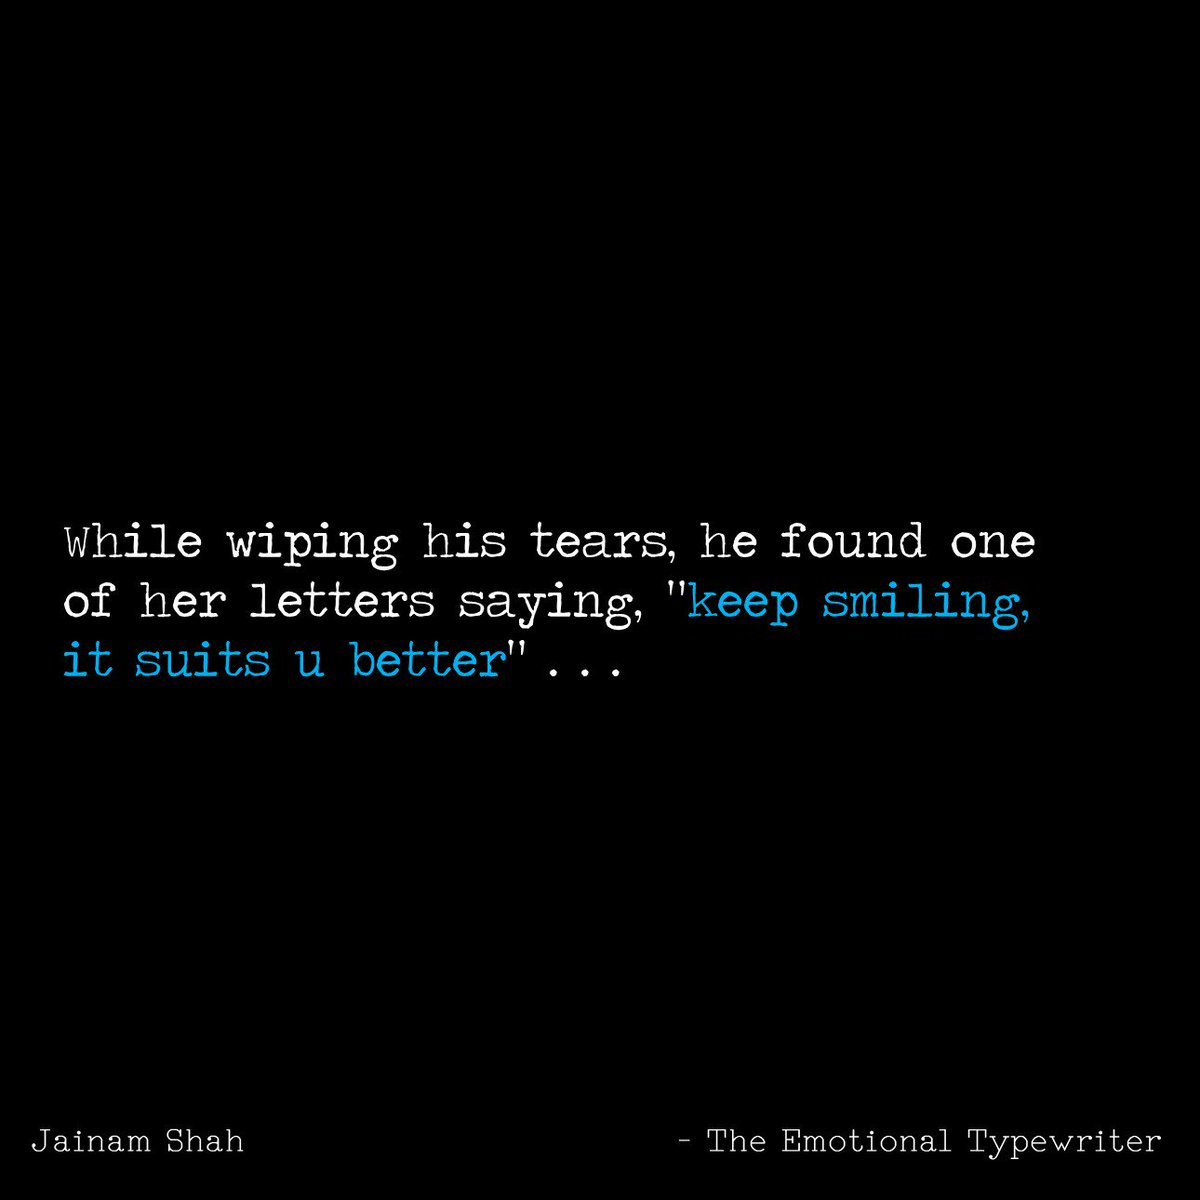 emotionaltypewriter on keep smiling😊 quotes